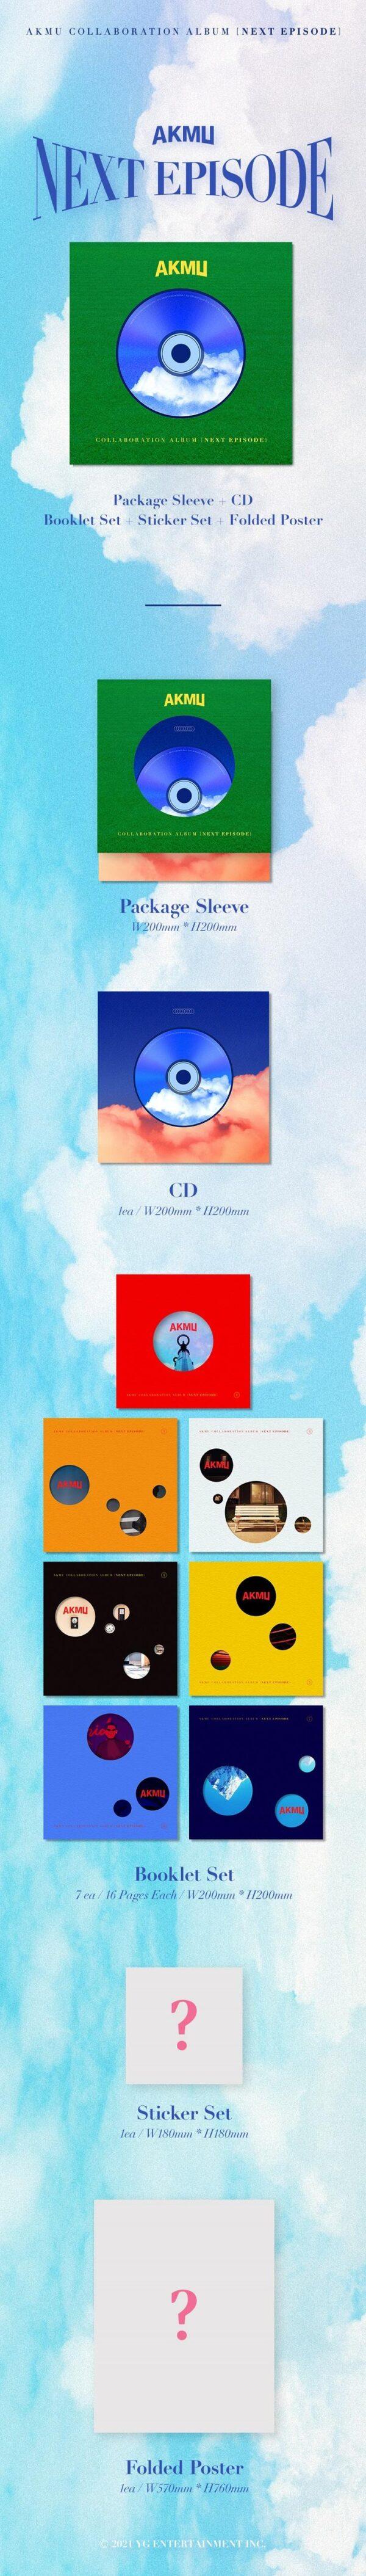 AKMU Collaboration Album NEXT EPISODE 1